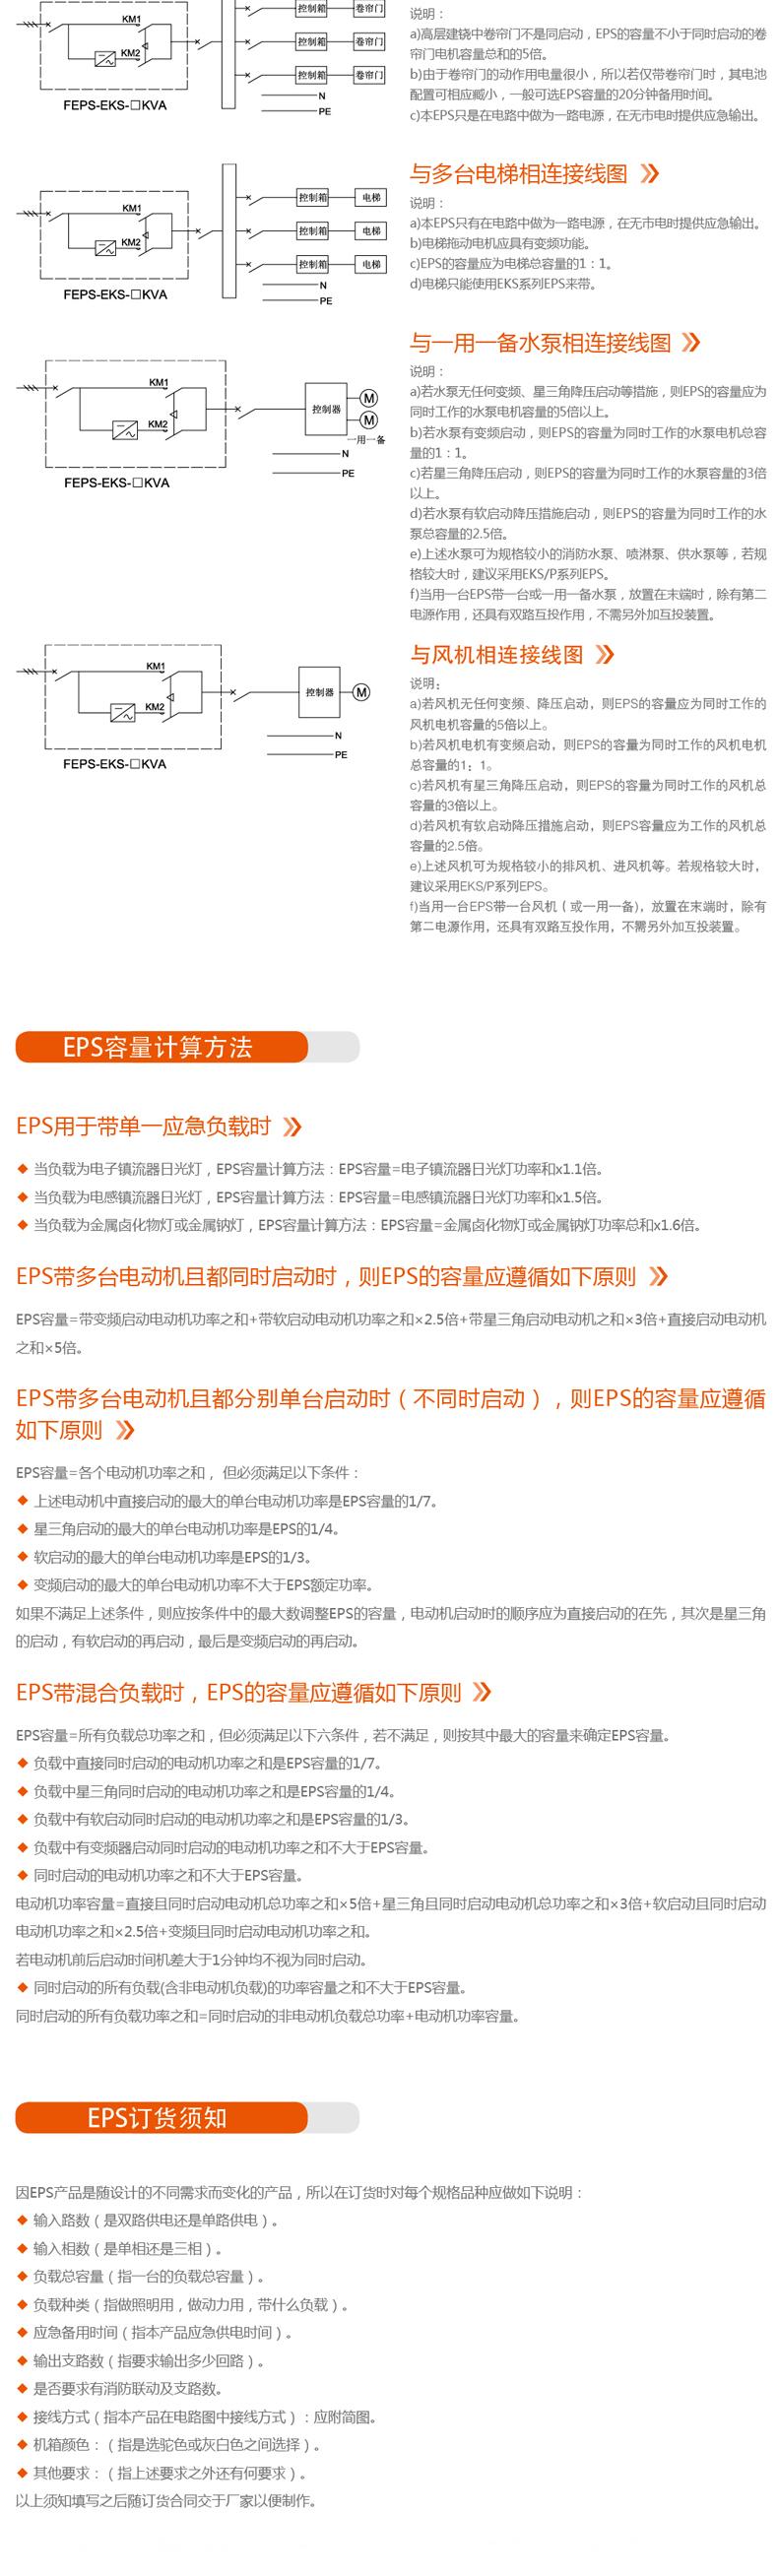 EPS詳情頁_05.jpg